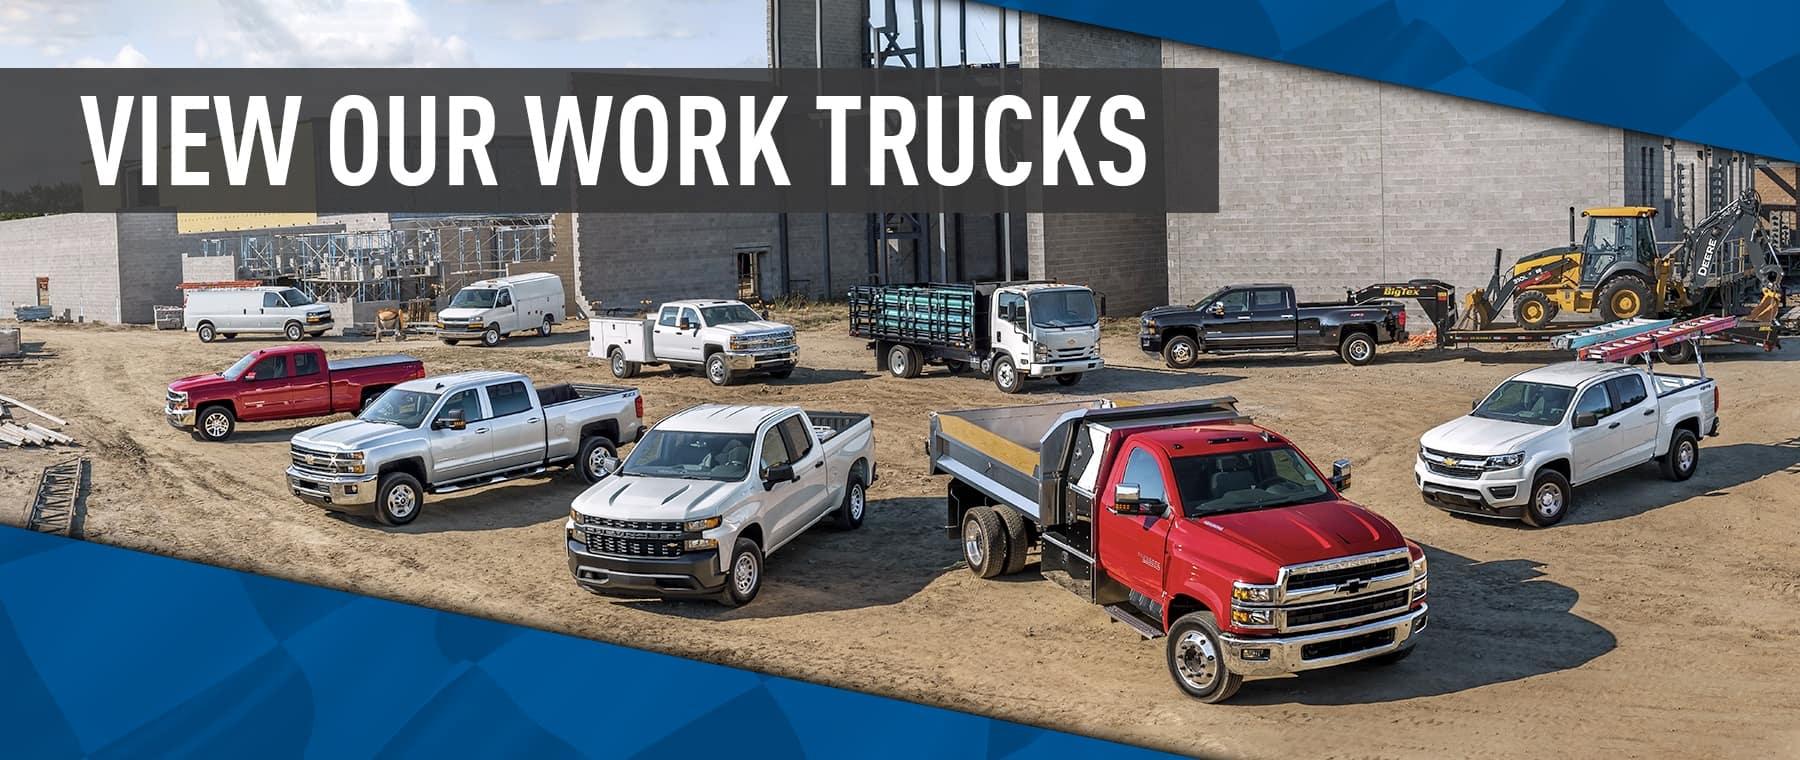 hight resolution of cars suvs wagons trucks commercial 2019 chevrolet malibu